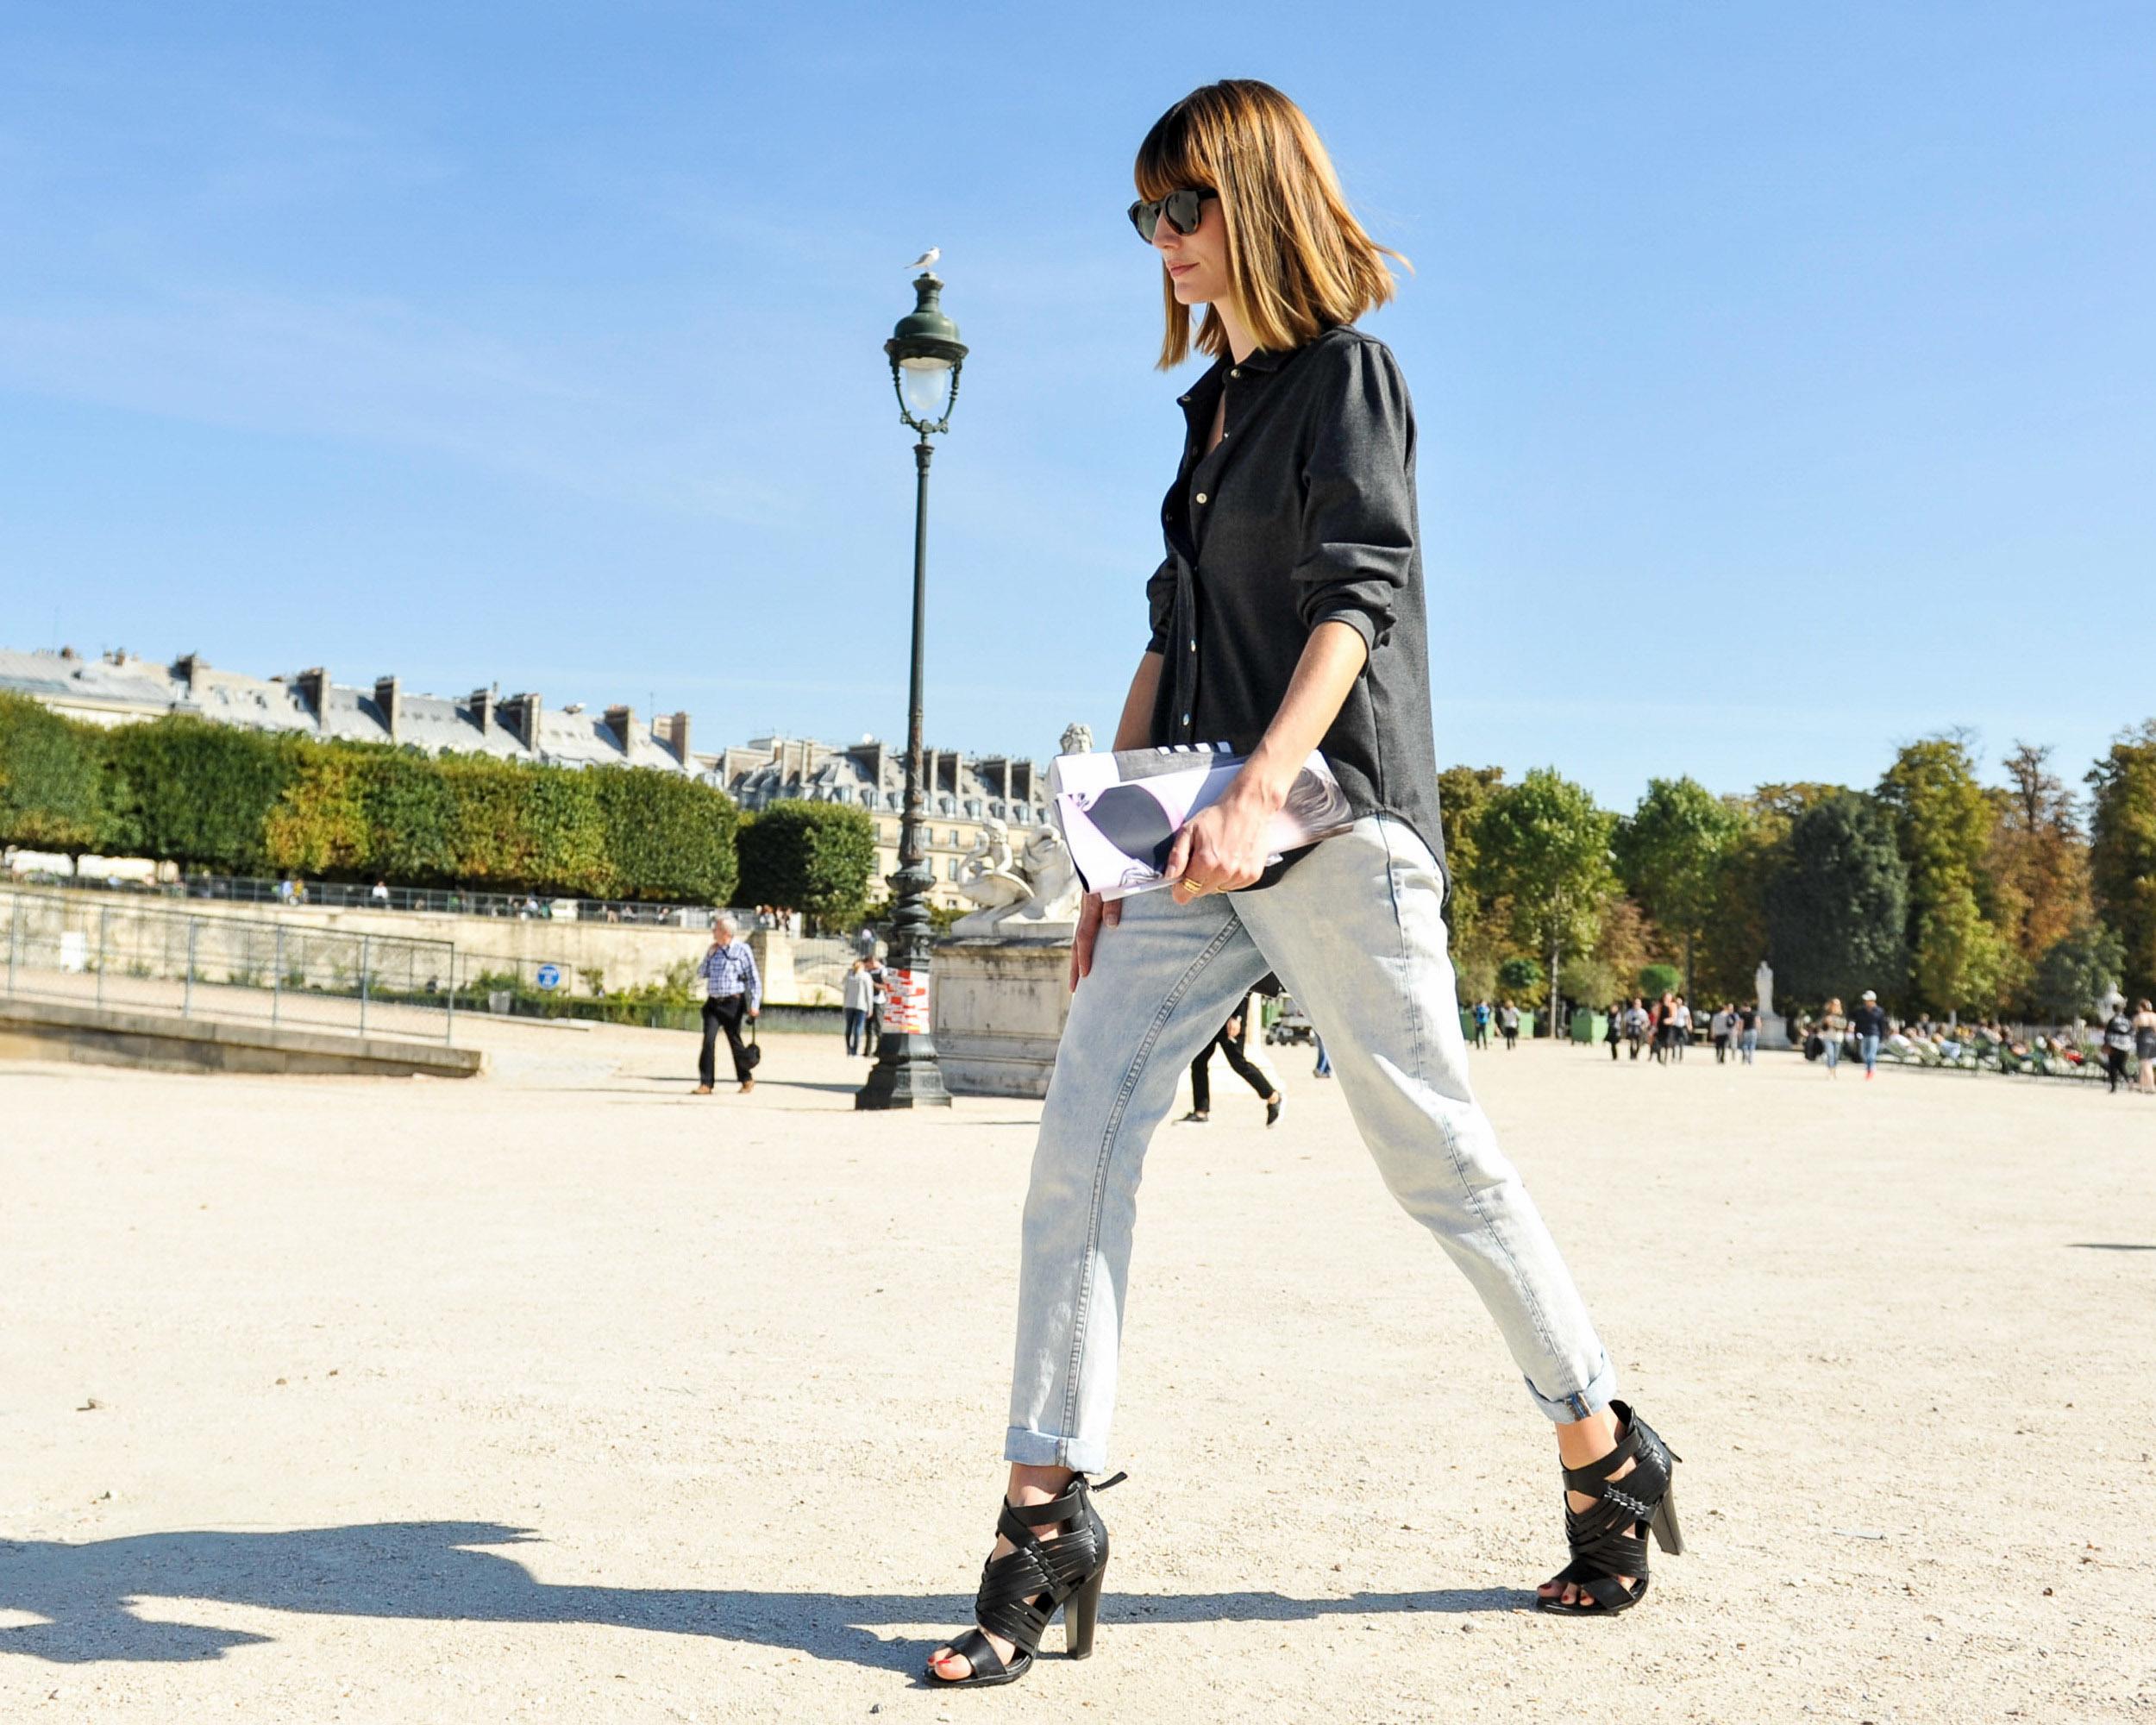 StreetStyle_ParisFashionWeek_LeandroJusten_088.jpg